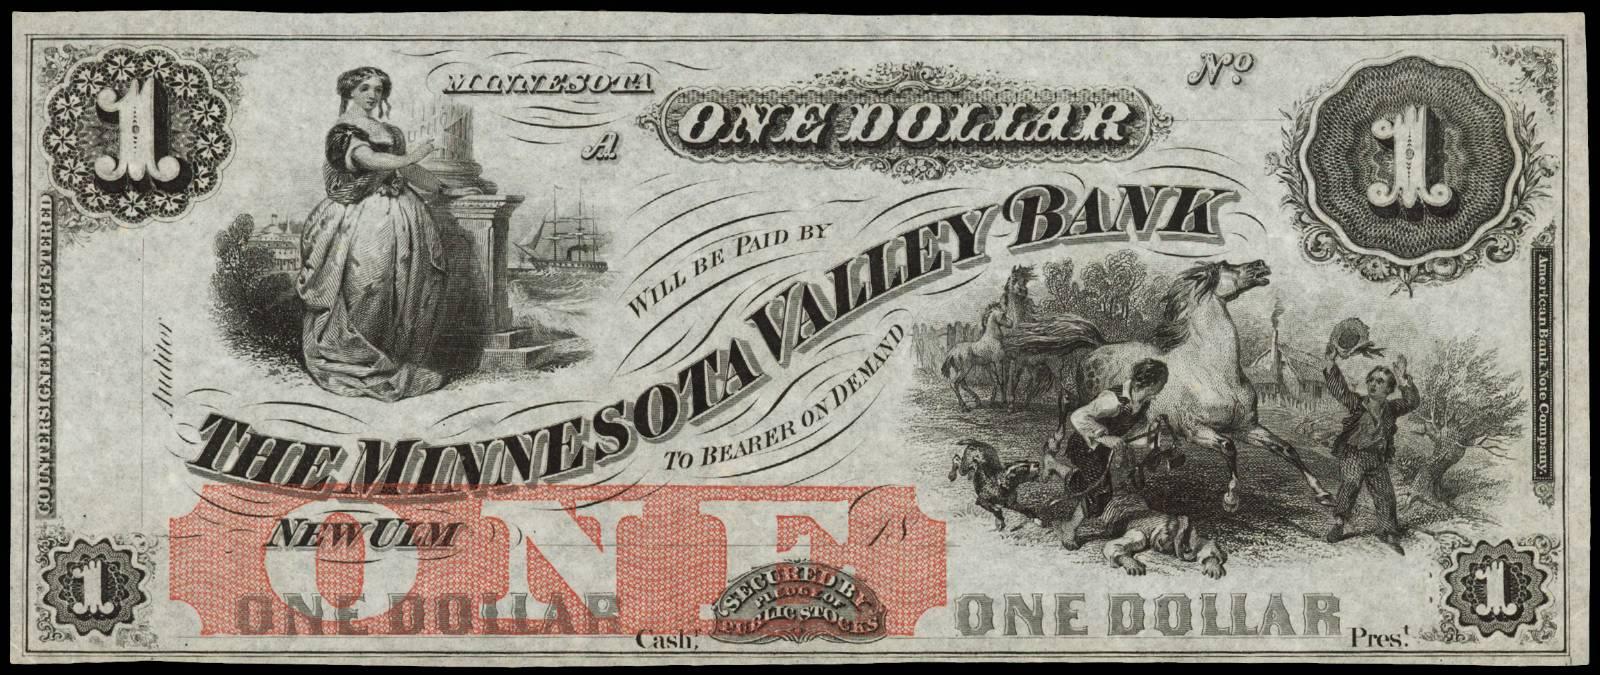 Minnesota Valley Bank